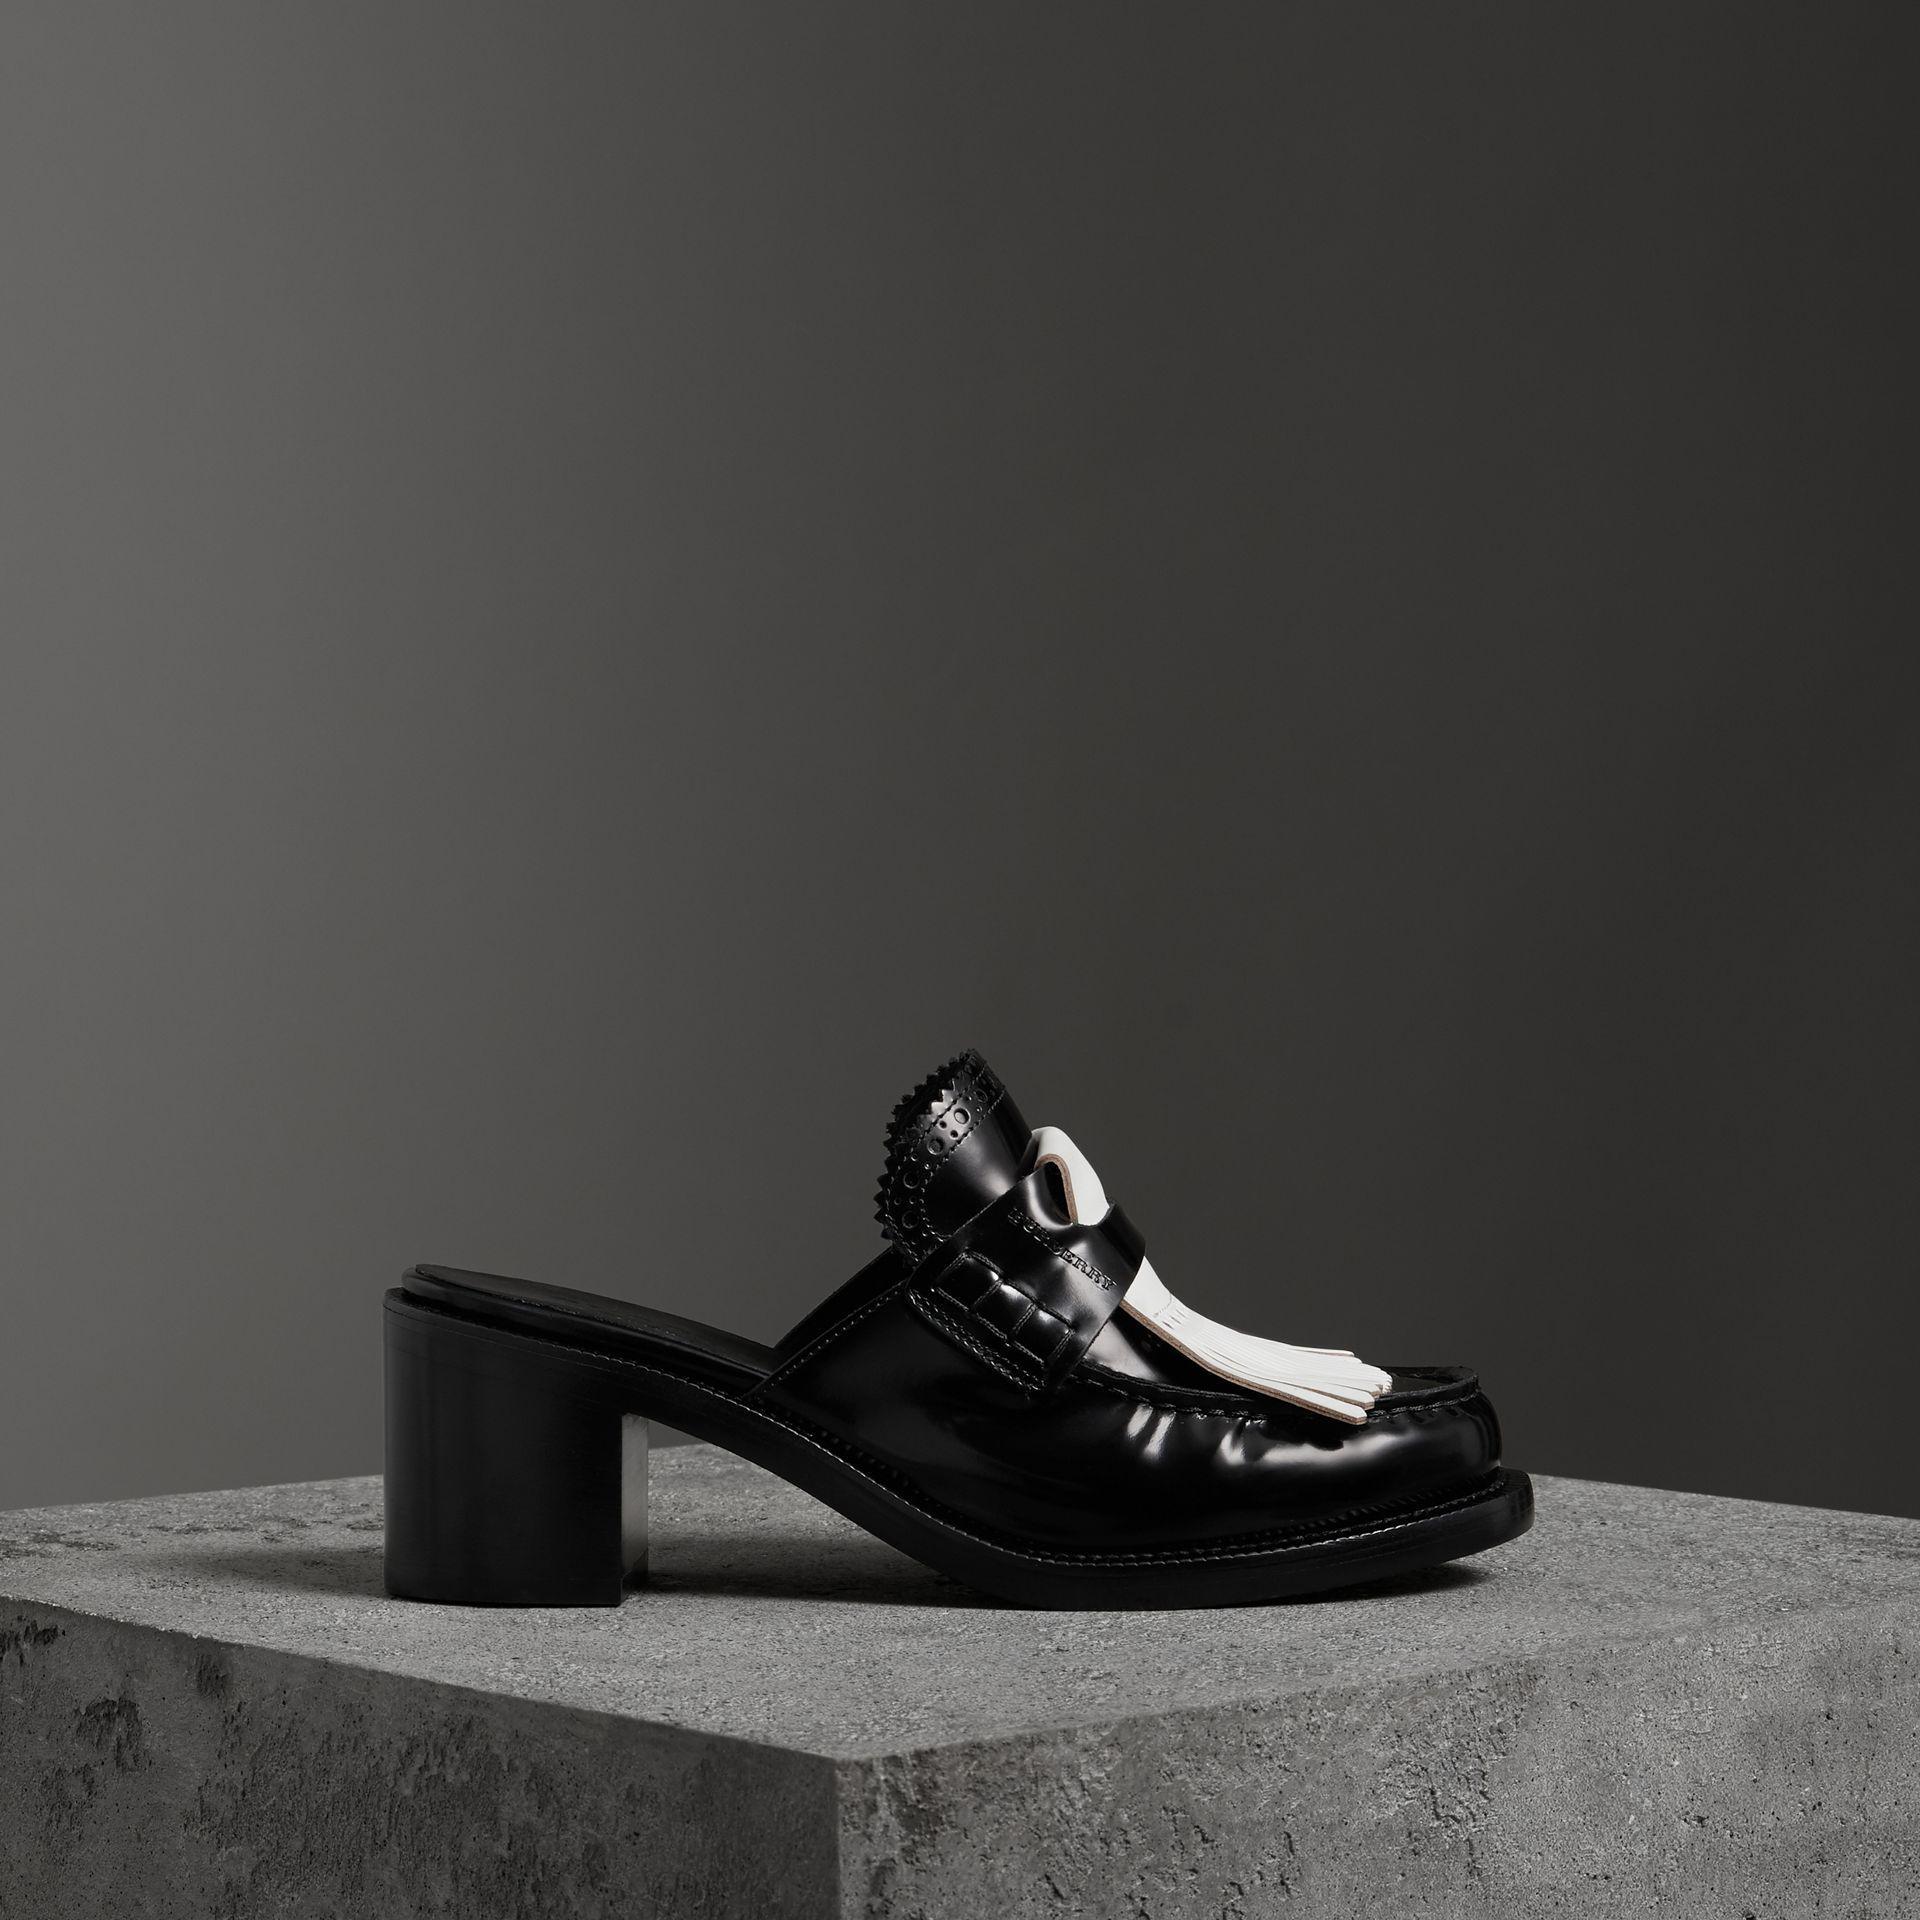 Burberry Contrast Kiltie Fringe Leather Block-heel Mules In Black